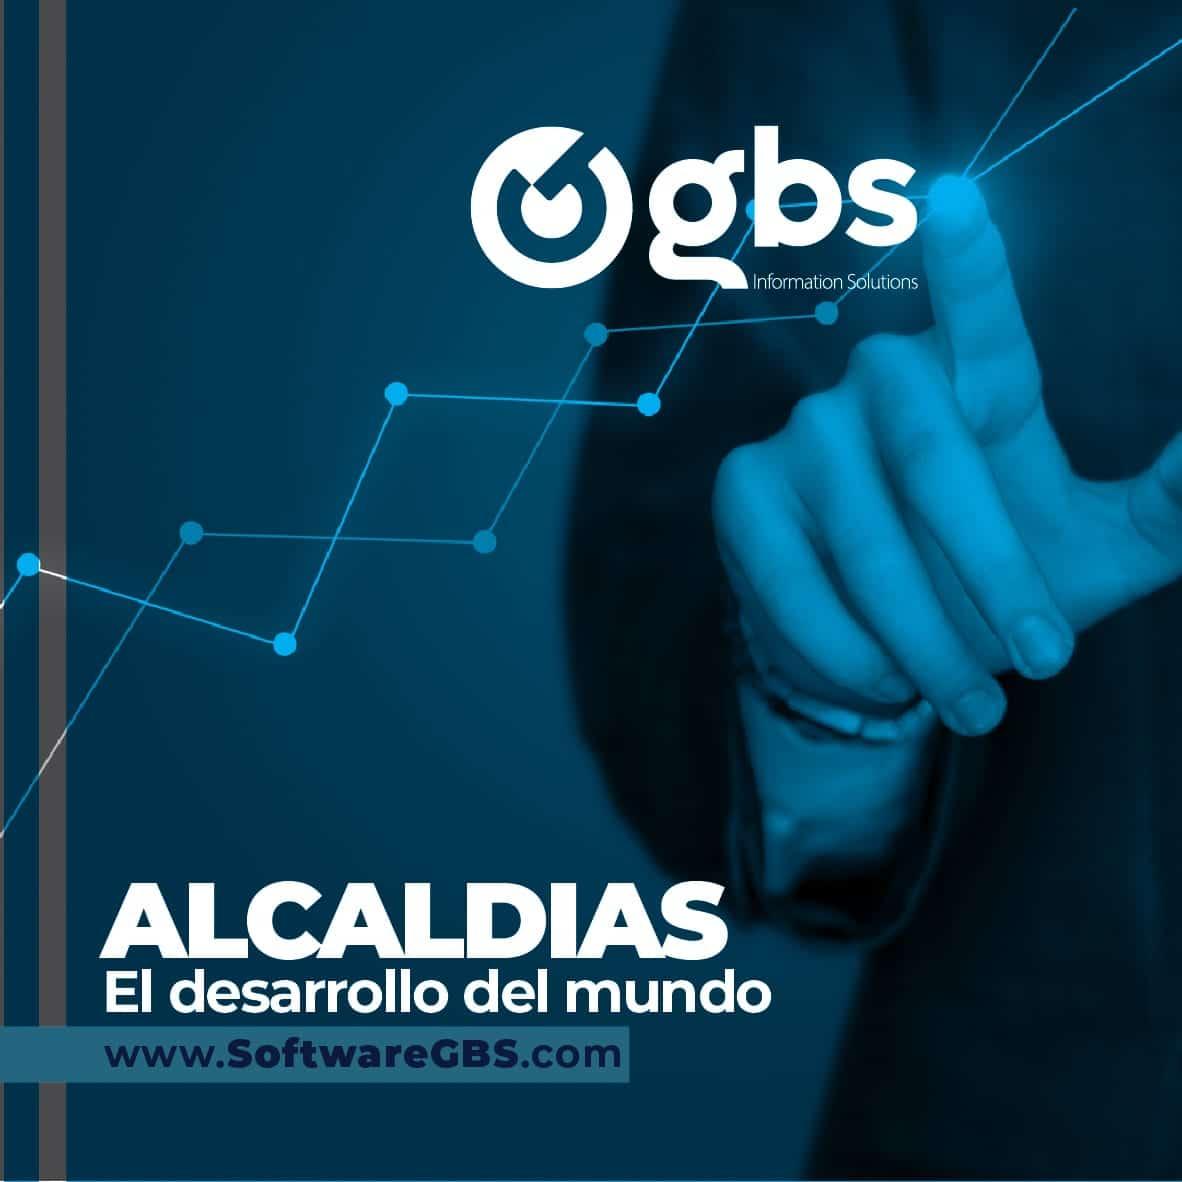 Software Contable Alcaldias - Software GBS